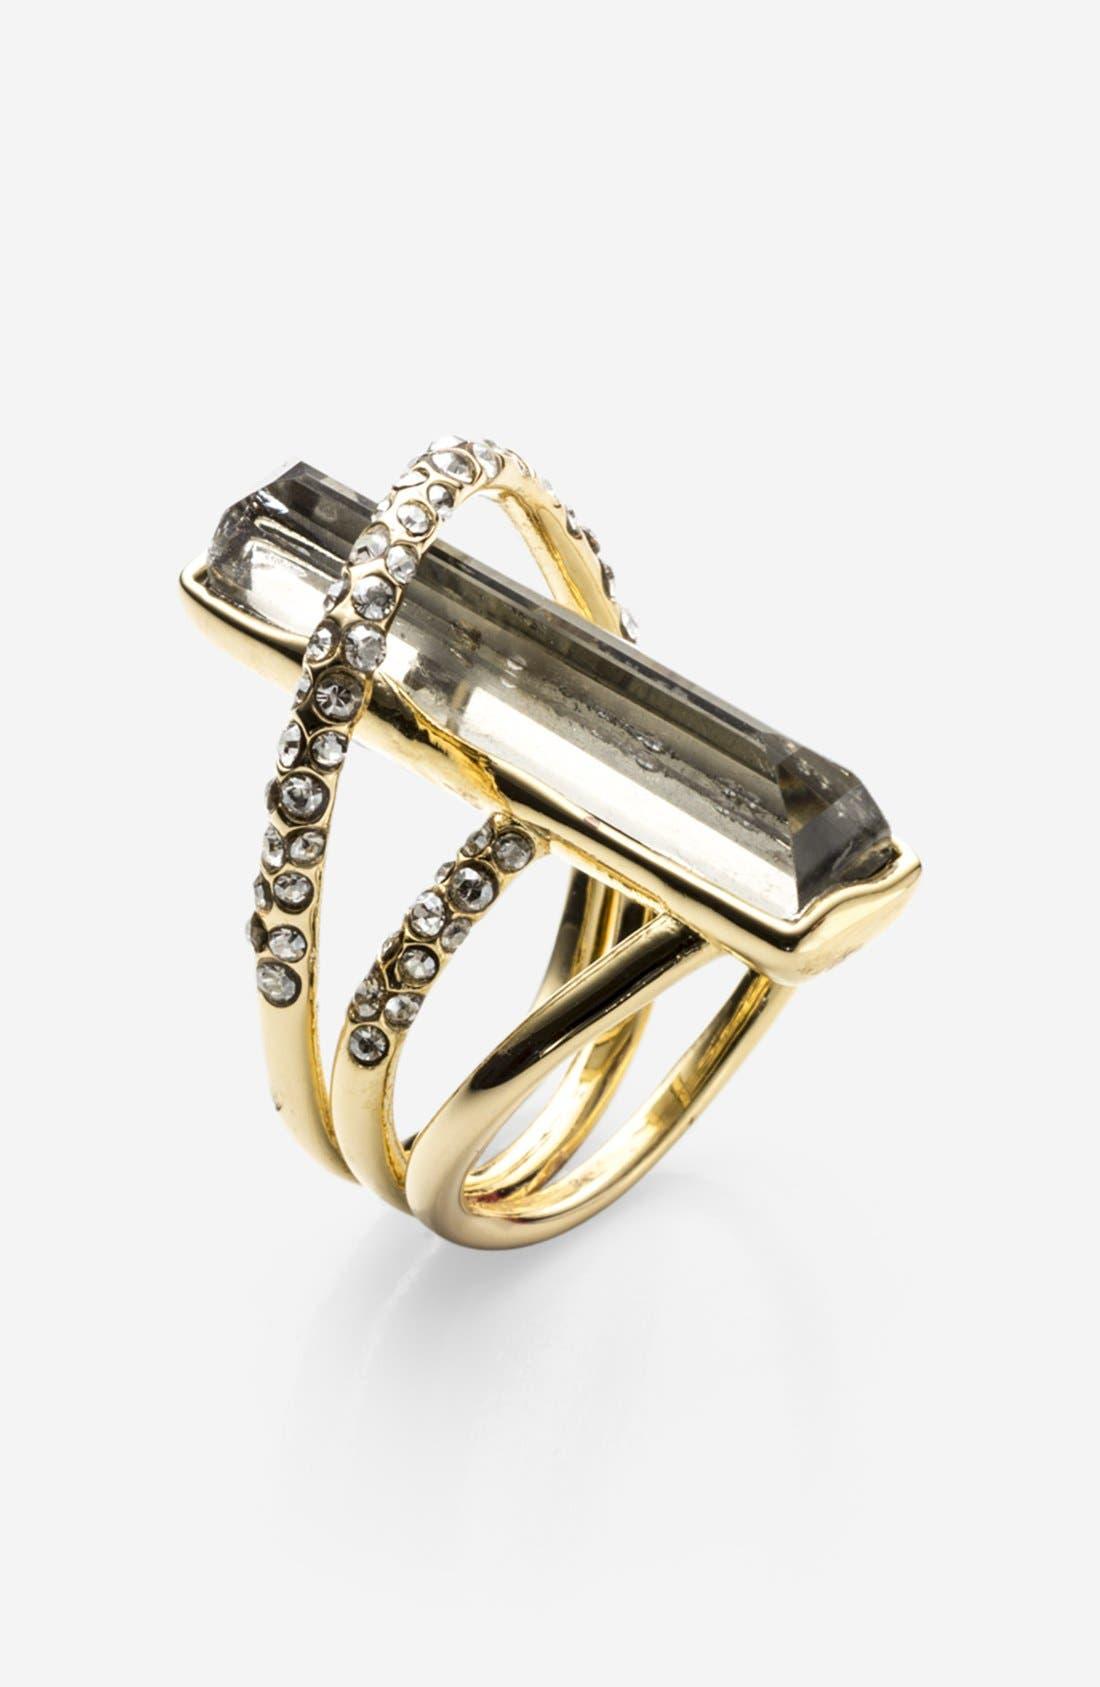 Main Image - Alexis Bittar 'Miss Havisham' Open Doublet Ring